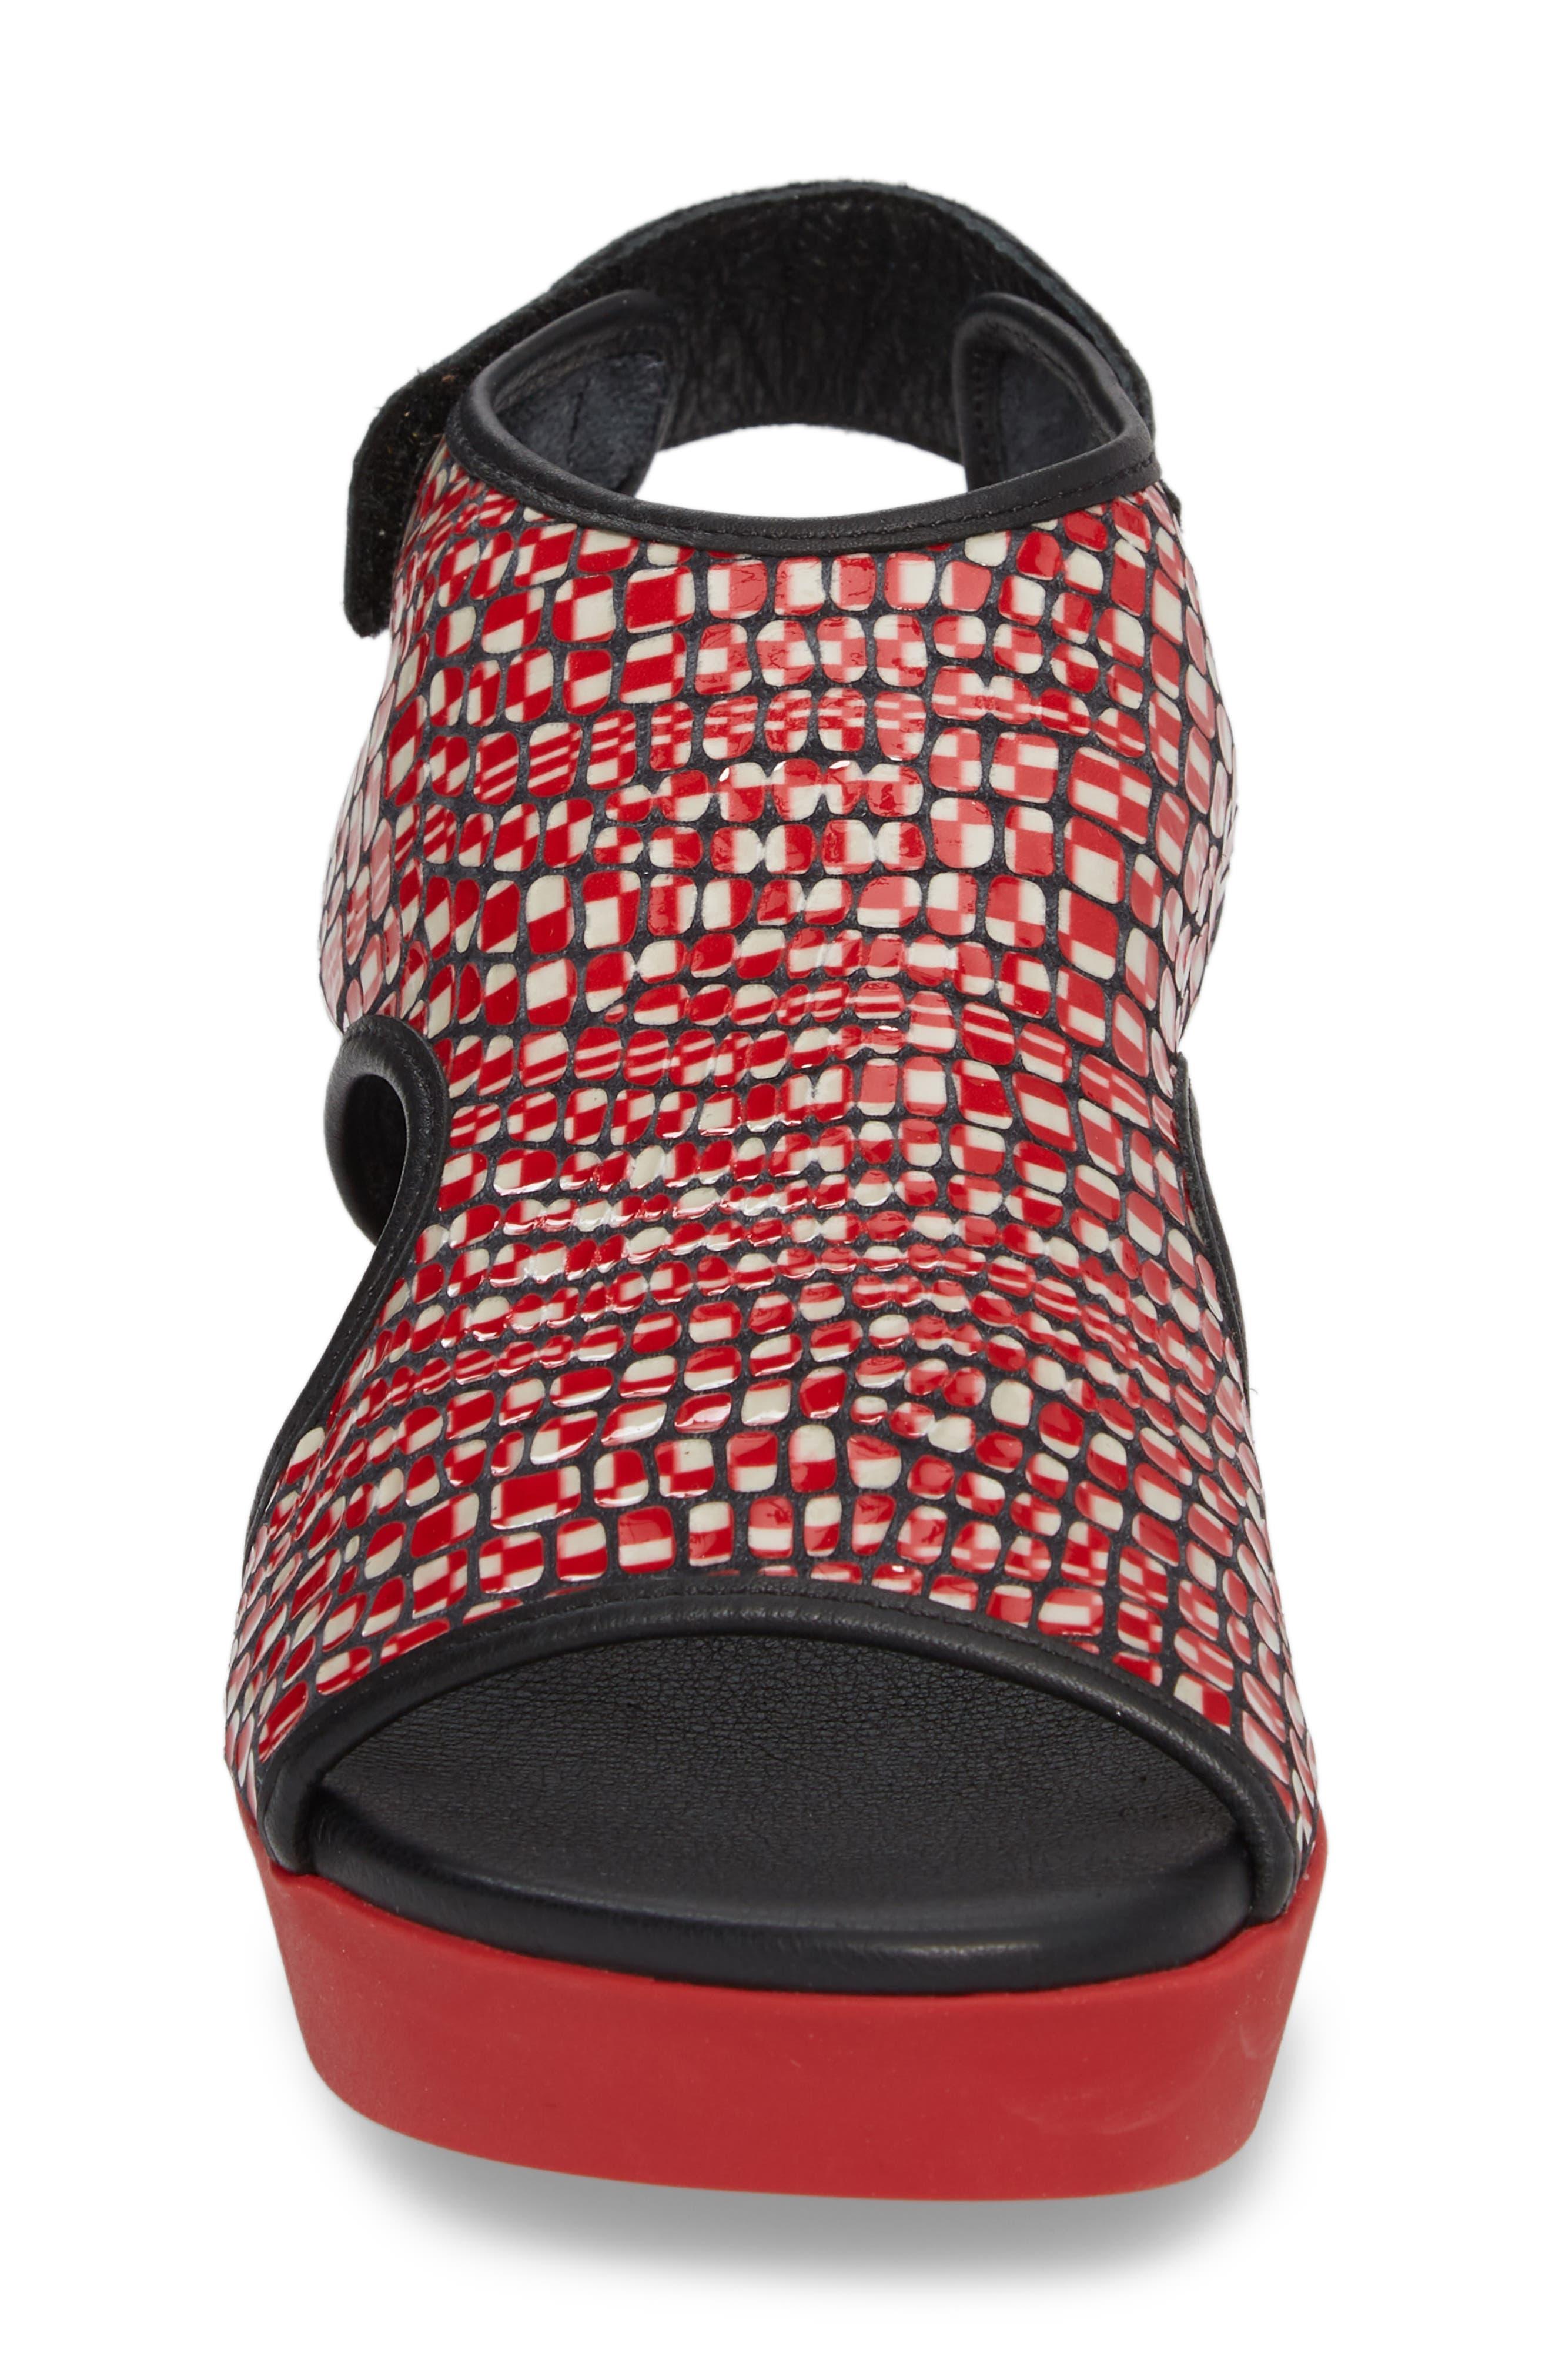 Naka Popa Wedge Sandal,                             Alternate thumbnail 4, color,                             Noir/ Rosso Leather